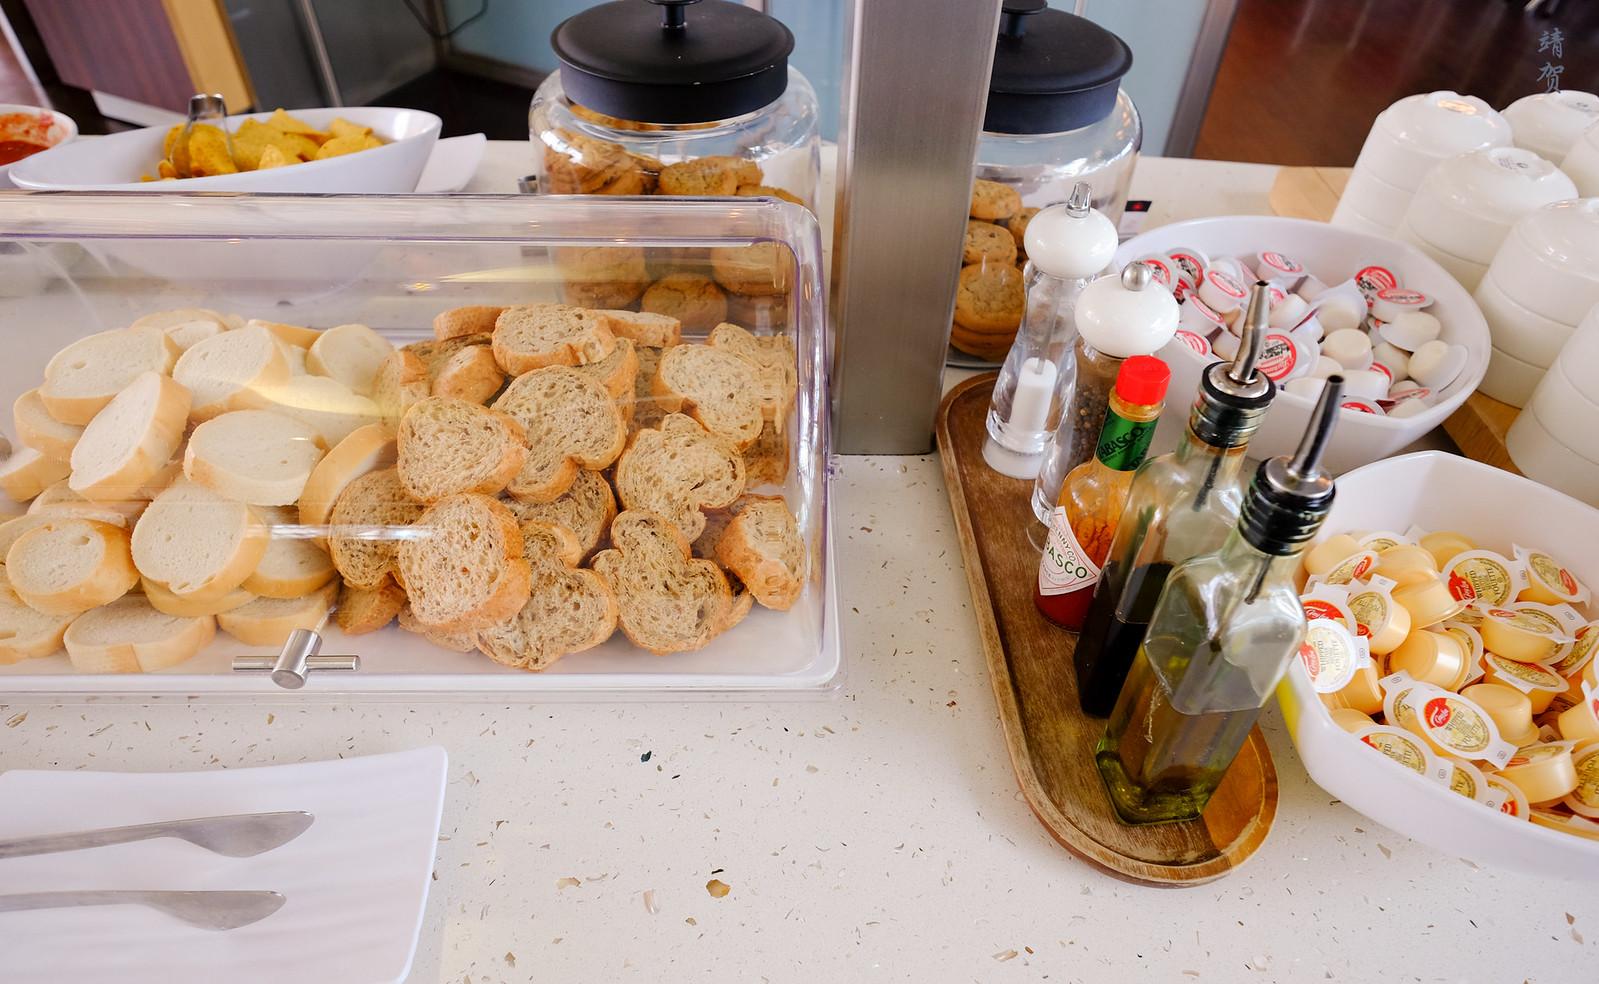 Bread and condiments